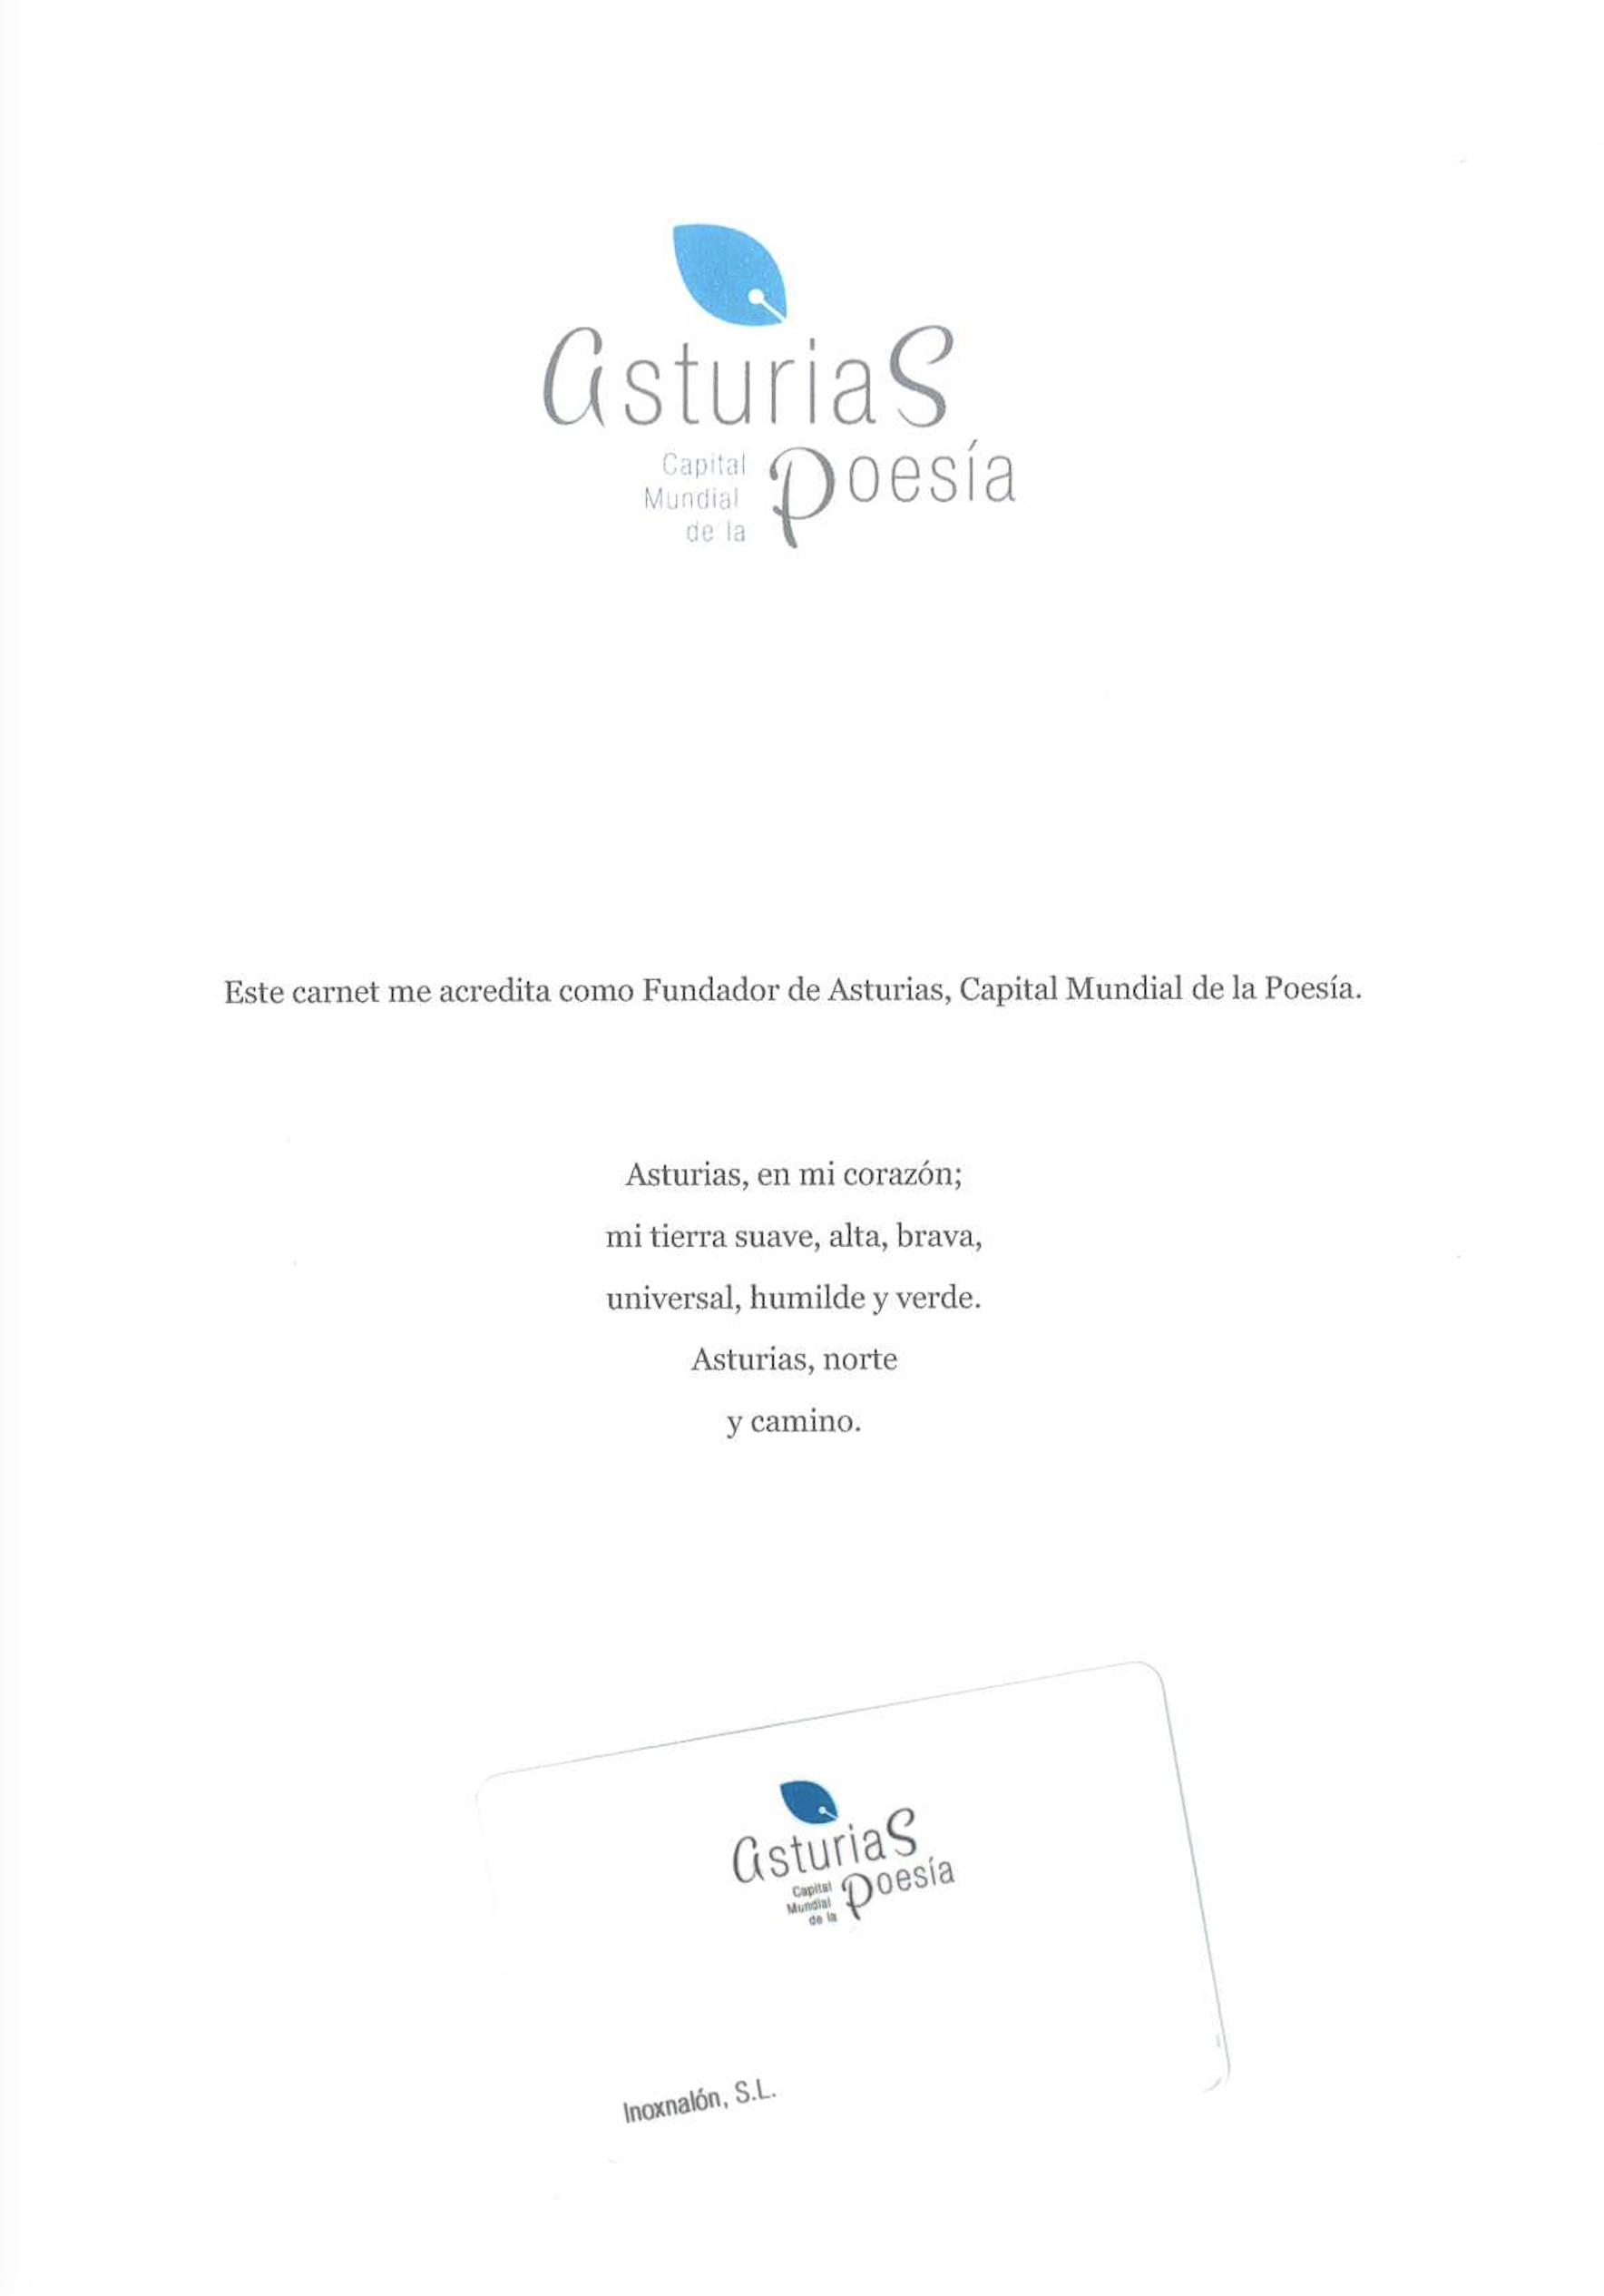 Carnet-Asturias-capital-de-poesia